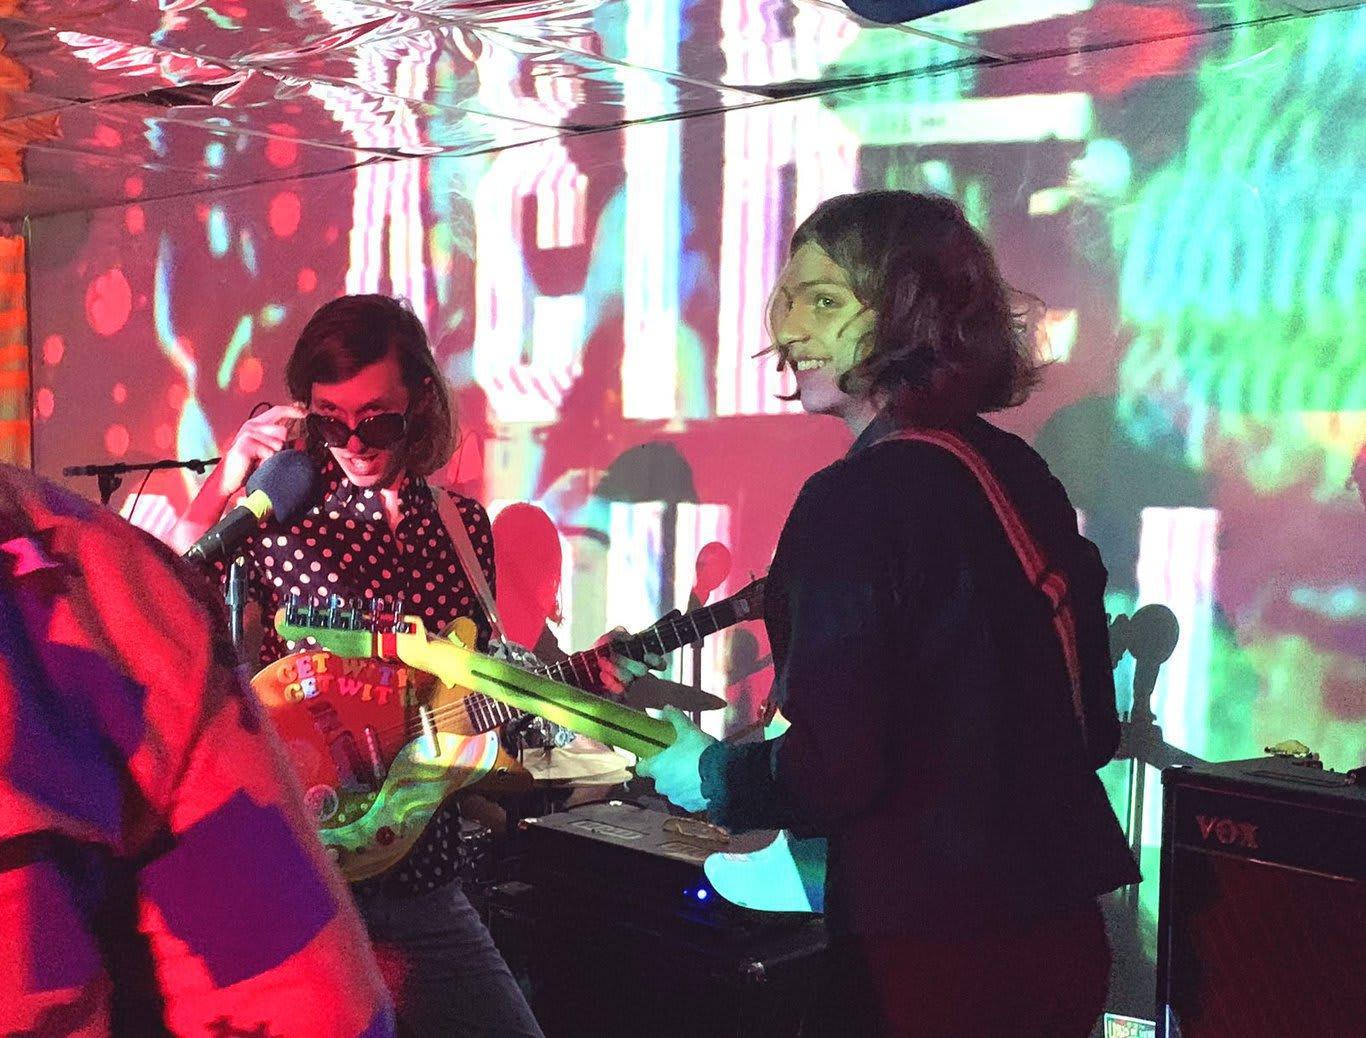 SXSW Snapshot: Acid Carousel at The Electric Church